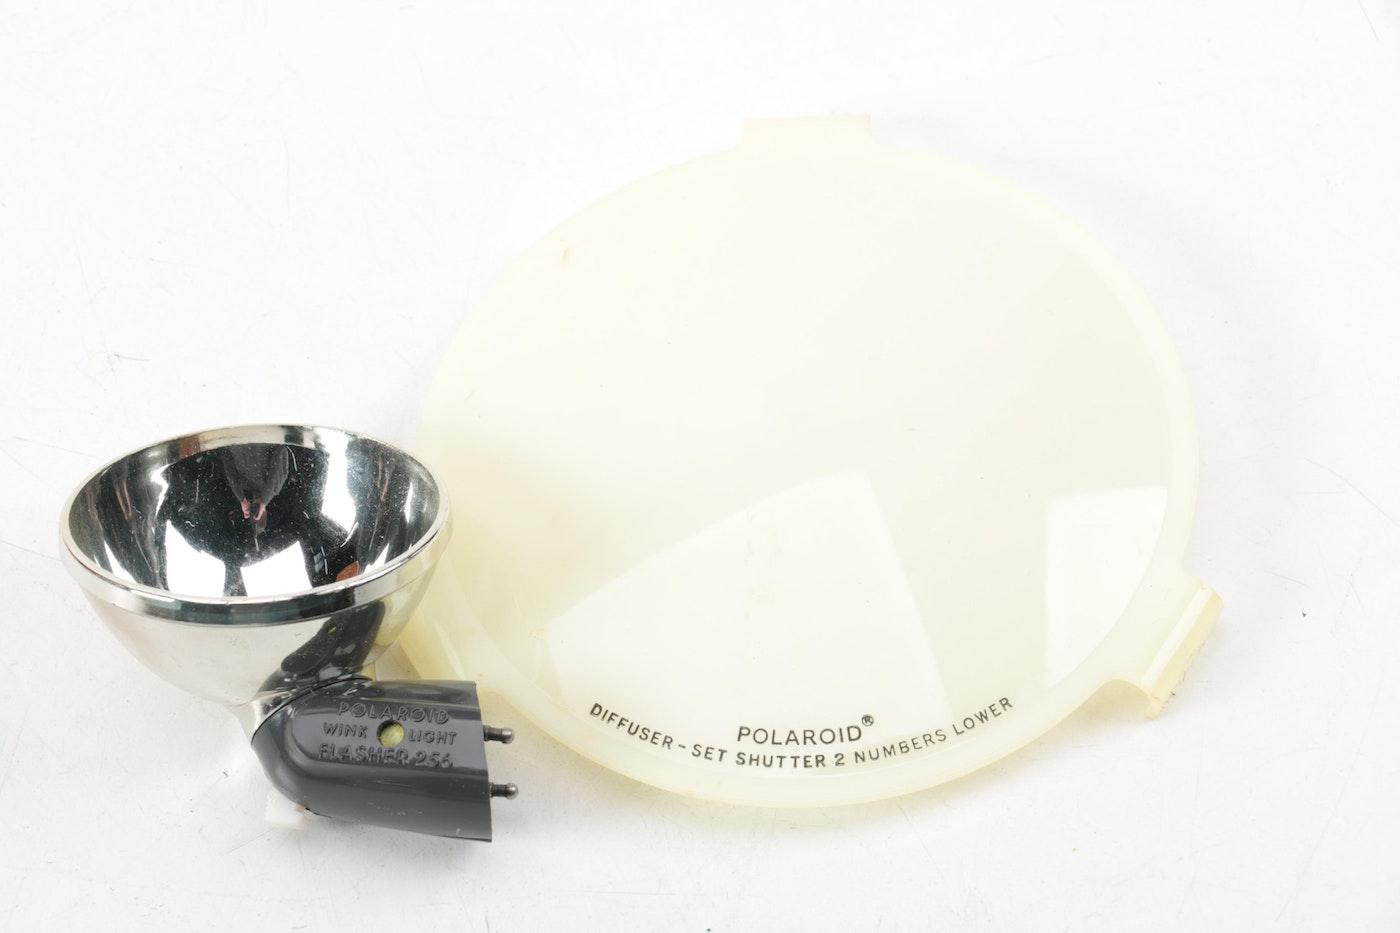 polaroid 800 land camera manual